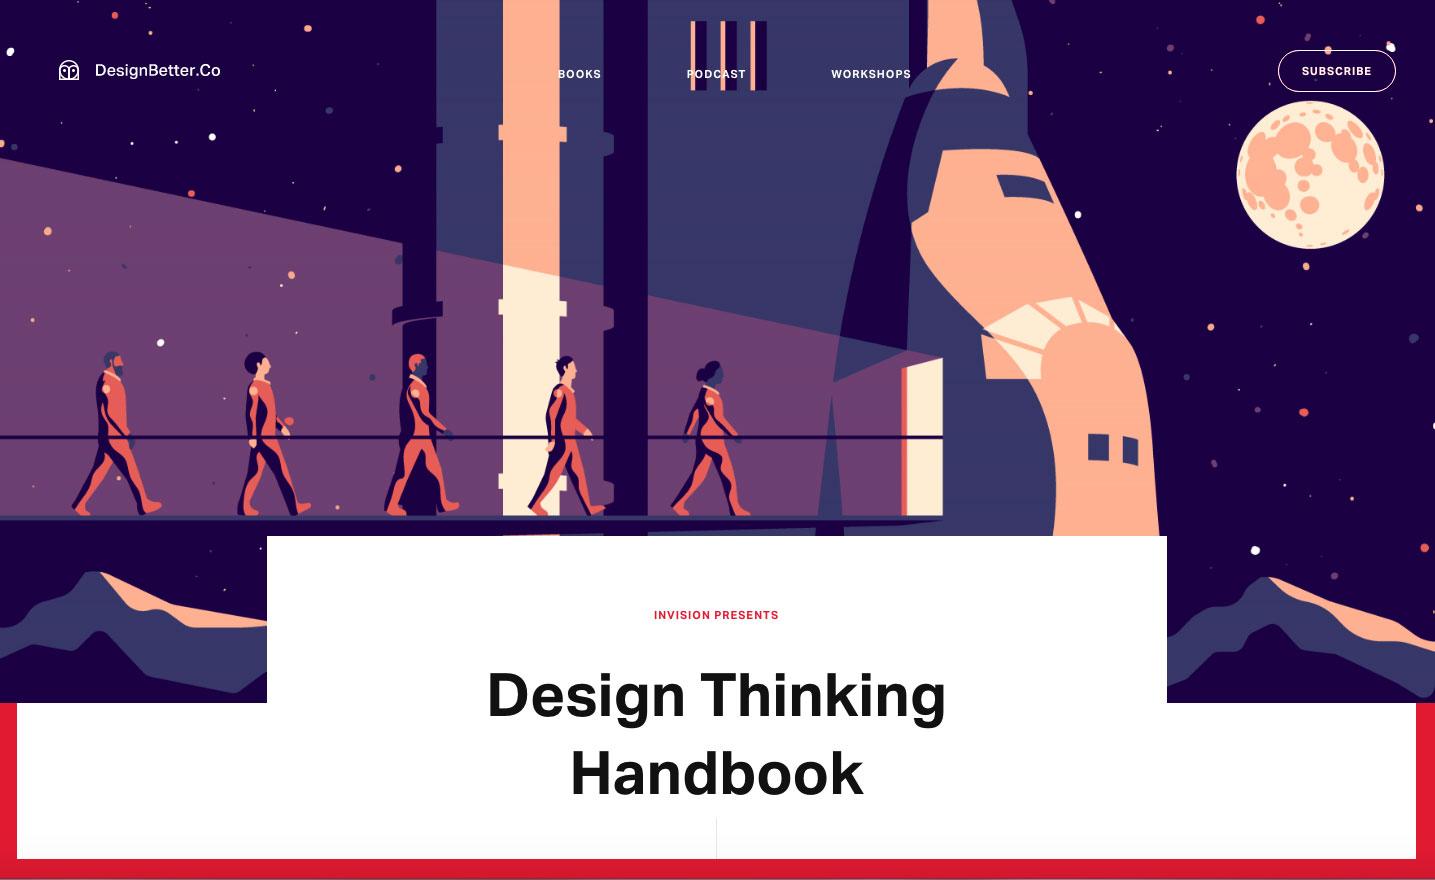 Free ebooks for designers: The DesignBetter.co library